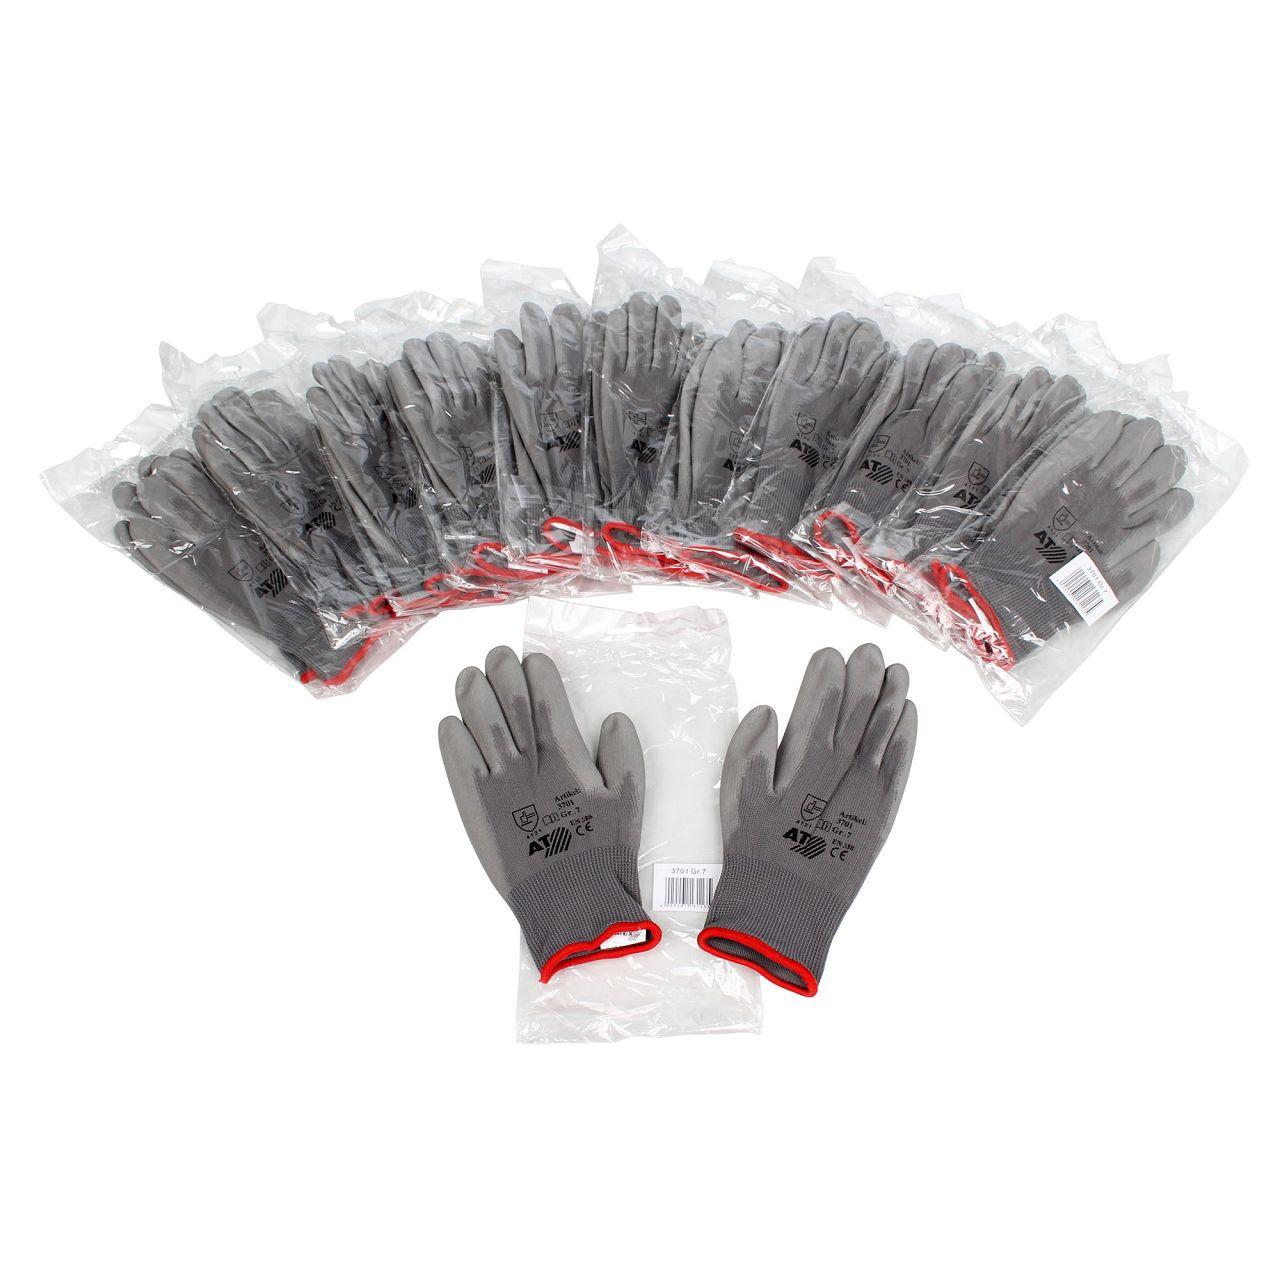 ASATEX 3701 Handschuhe Arbeitshandschuhe GUMMIERT - GRAU Größe 7 / S (12 Paar)